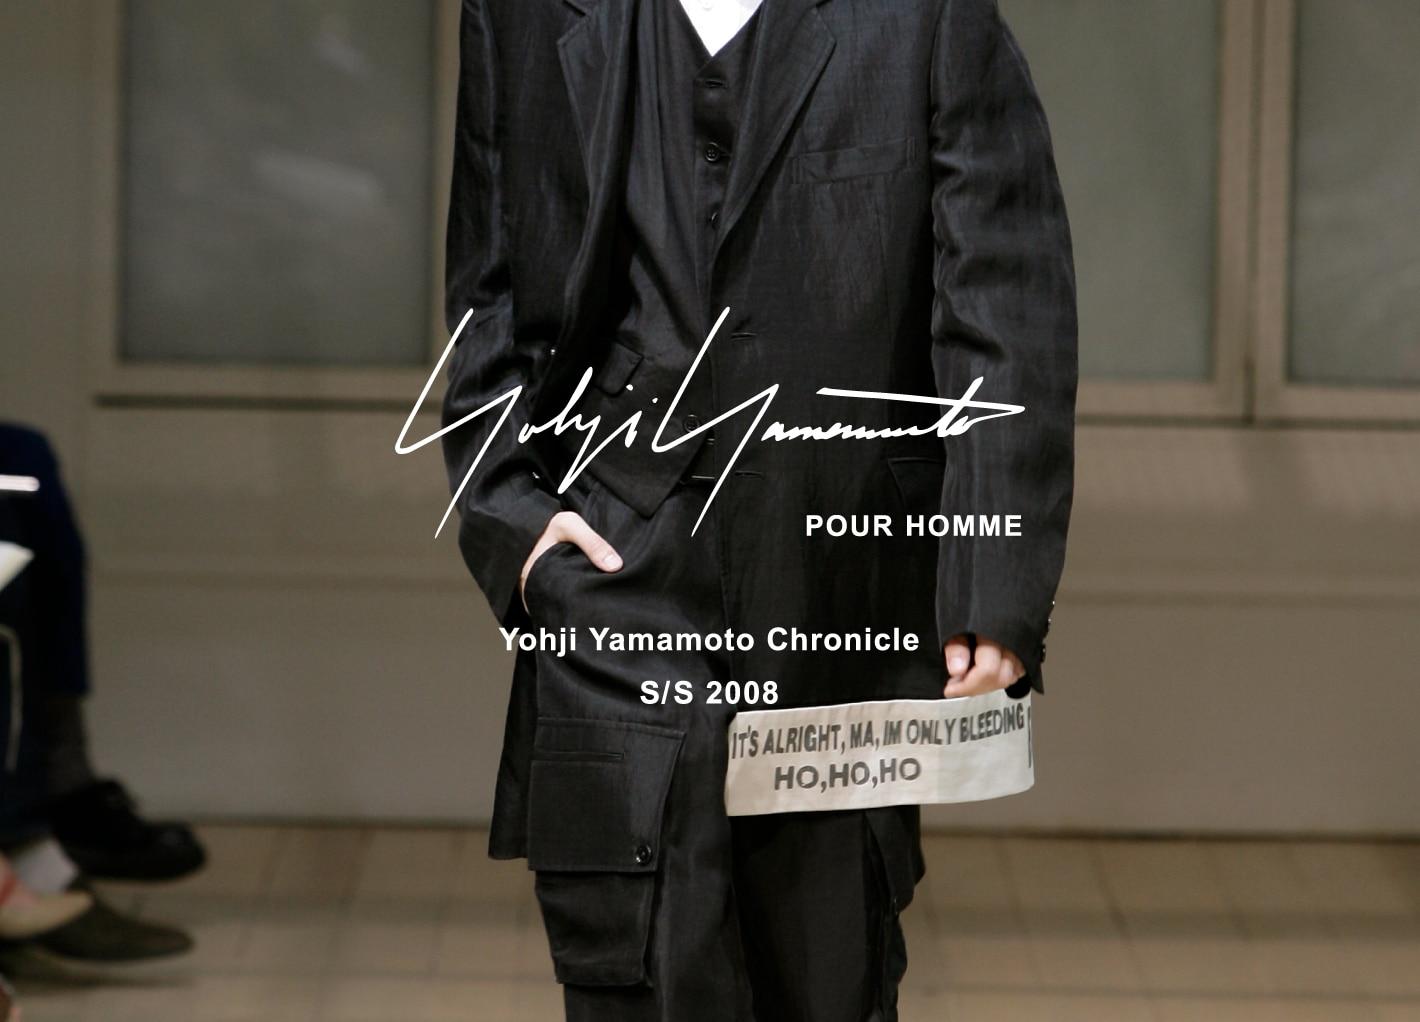 Yohji Yamamoto Chronicle – POUR HOMME SS 2008